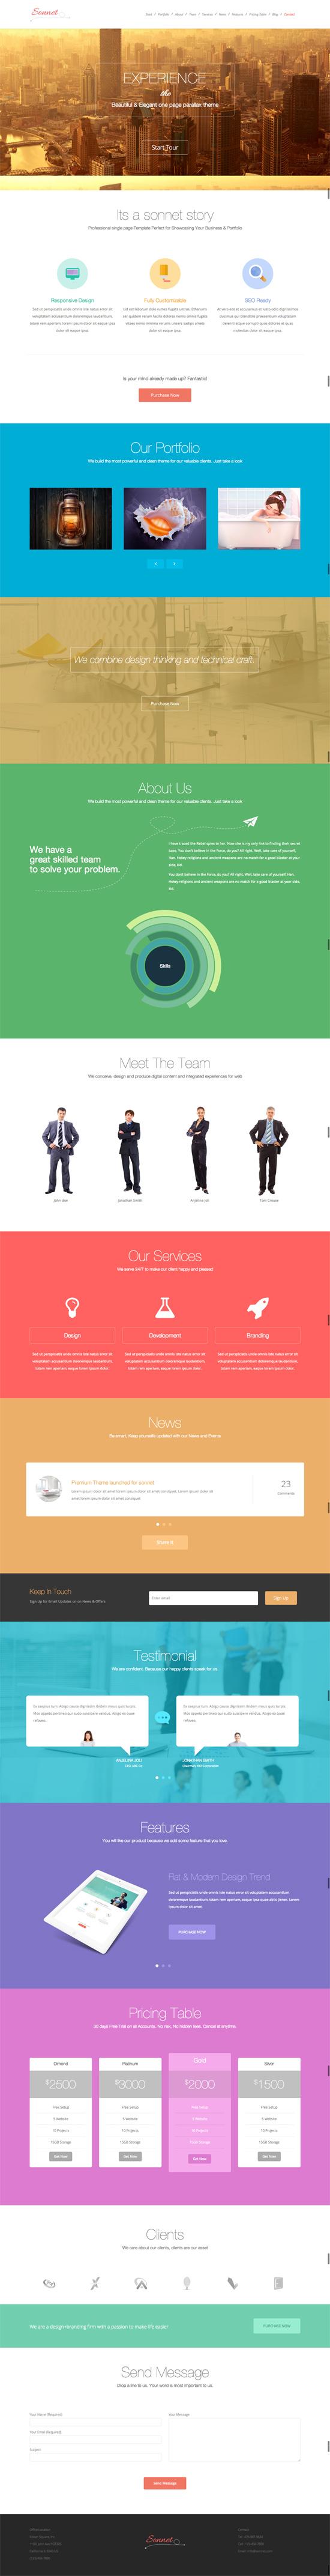 Sonnet - One Page Parallax Multipurpose Portfolio